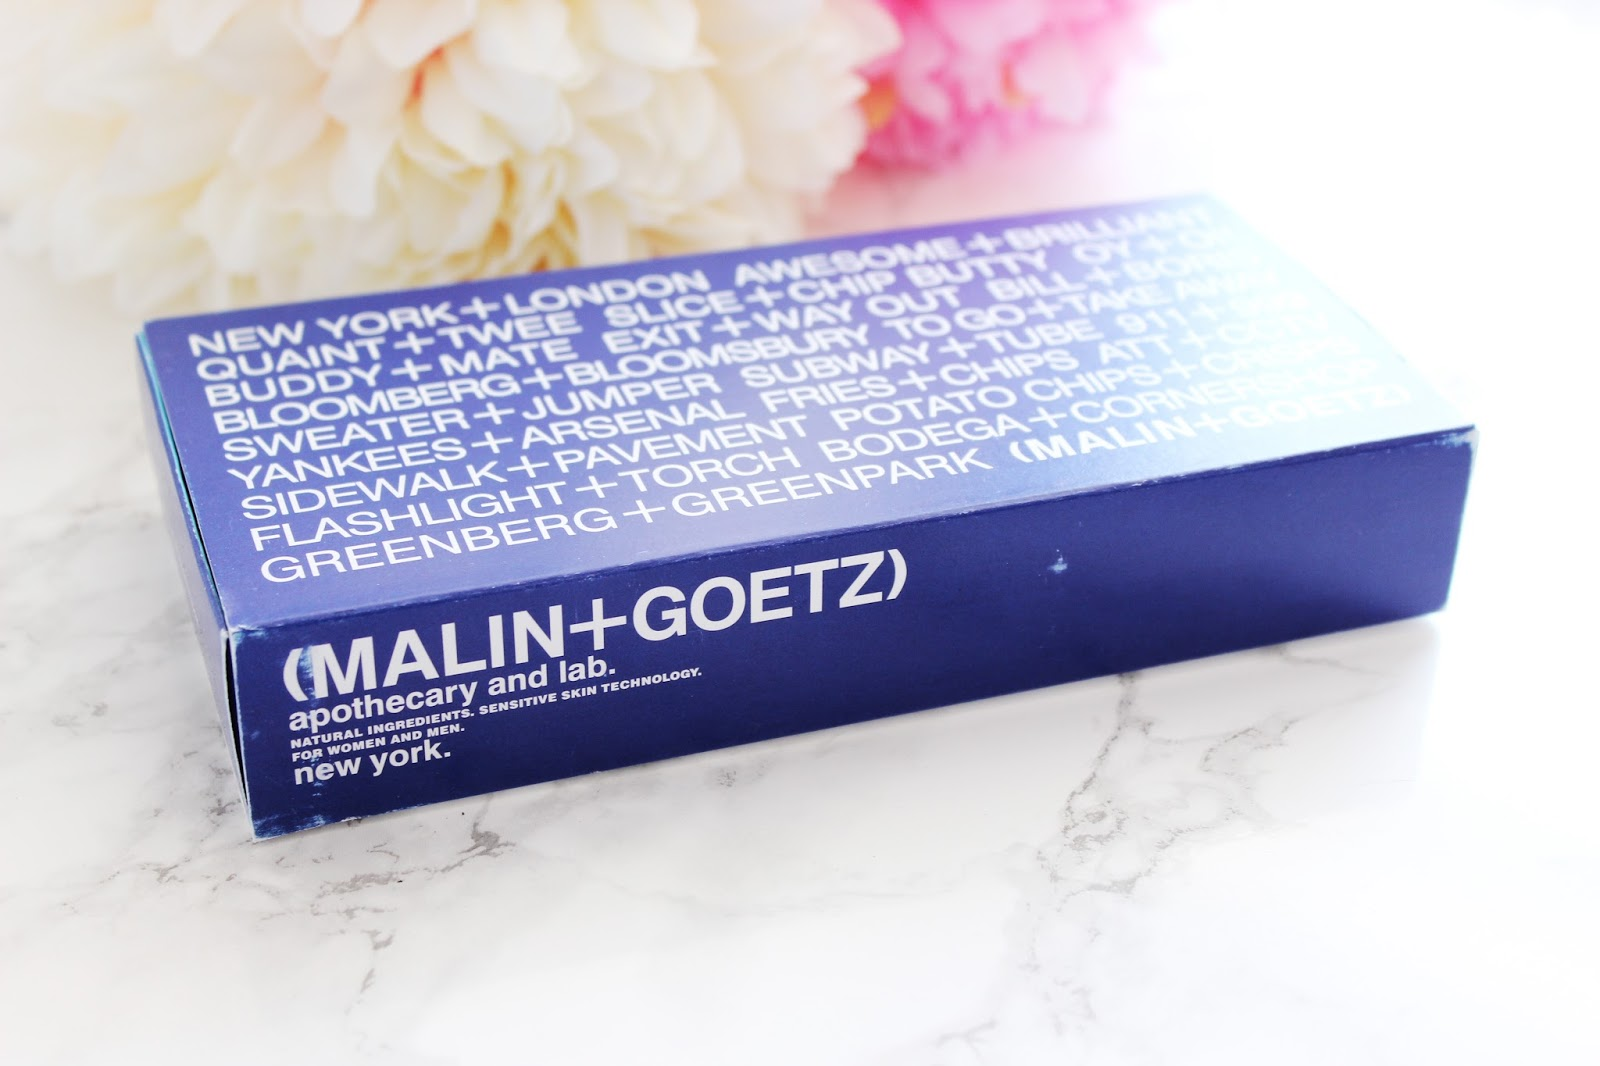 Malin+Goetz skincare by Jen Lou Meredith